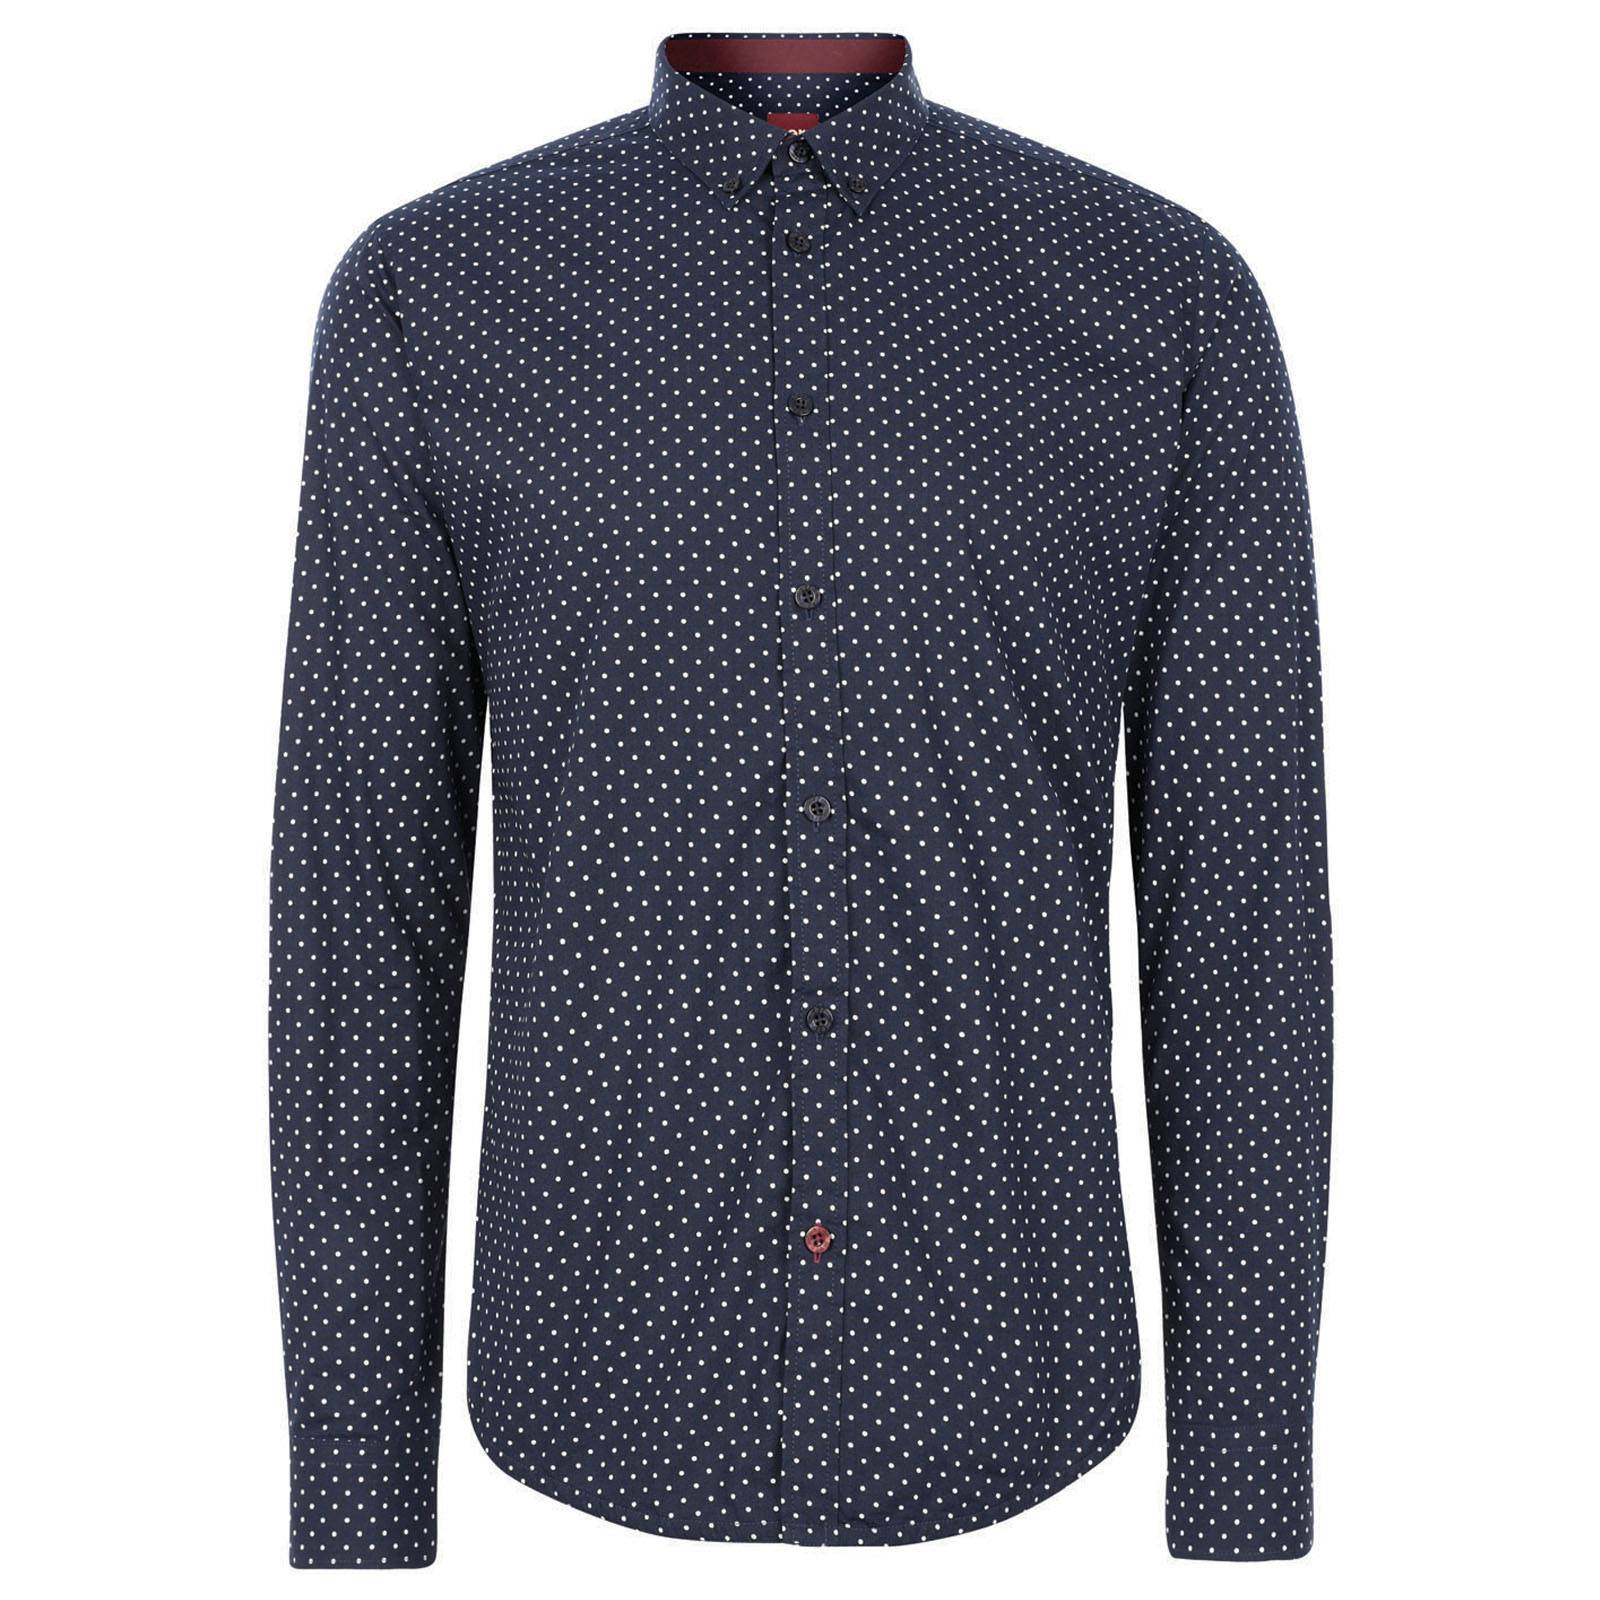 Рубашка SiegelCORE<br><br><br>Артикул: 1513208<br>Материал: 100% хлопок<br>Цвет: синий<br>Пол: Мужской